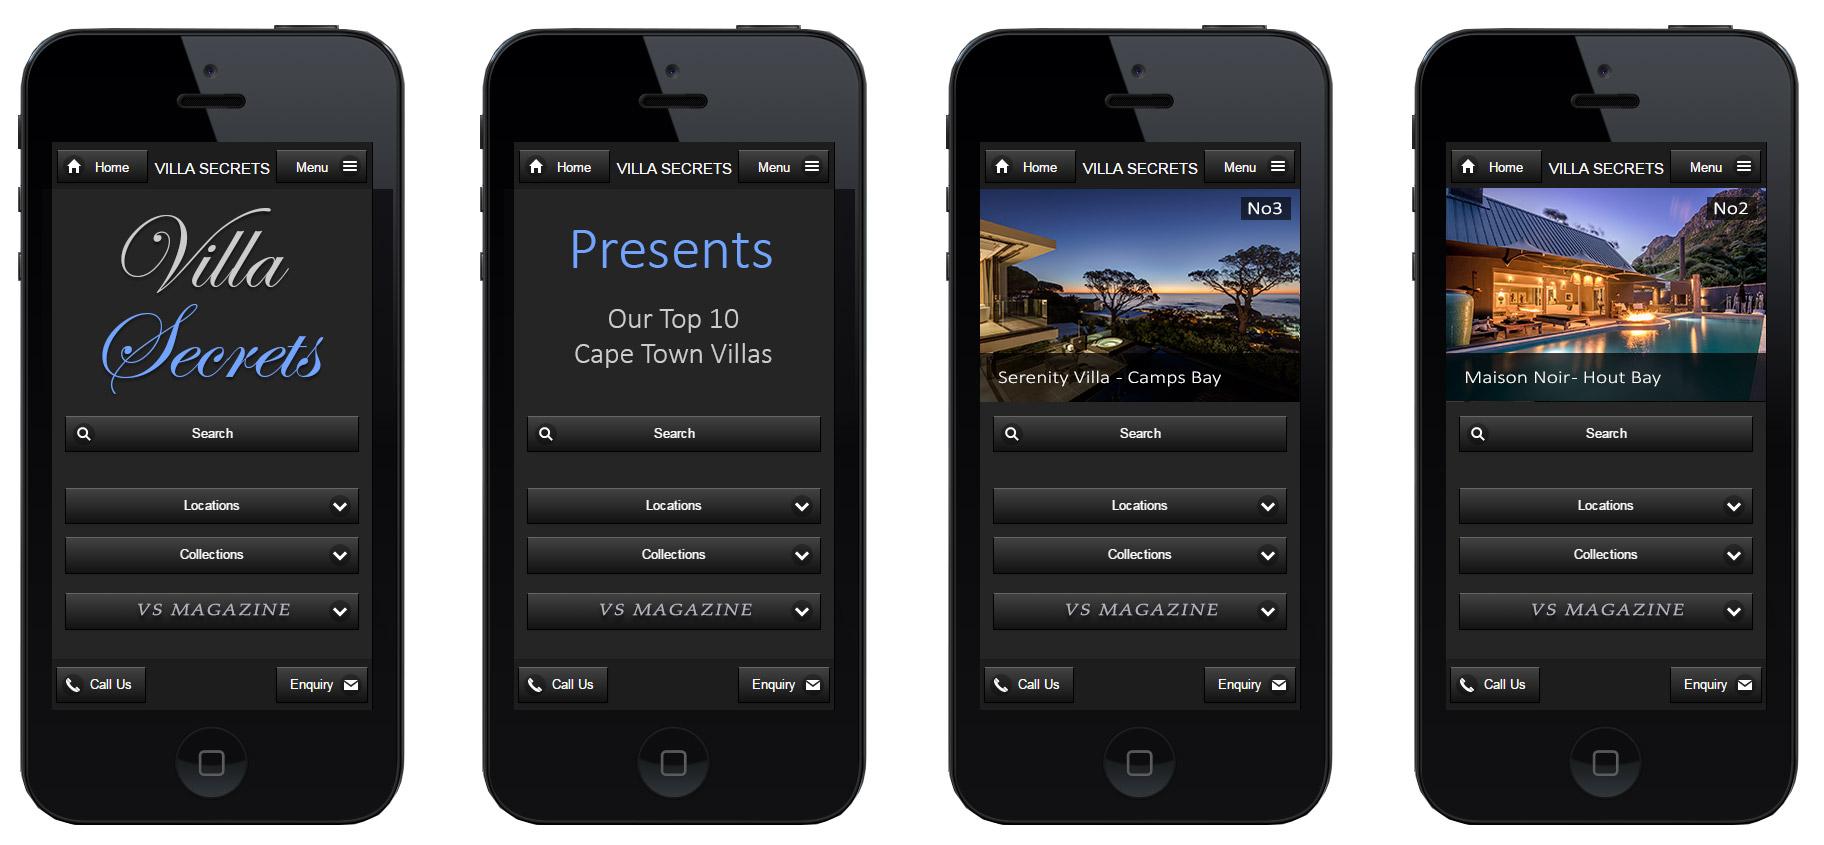 Villa-Secrets-JQuery-Mobile-Website---Homepage-Slide-Show